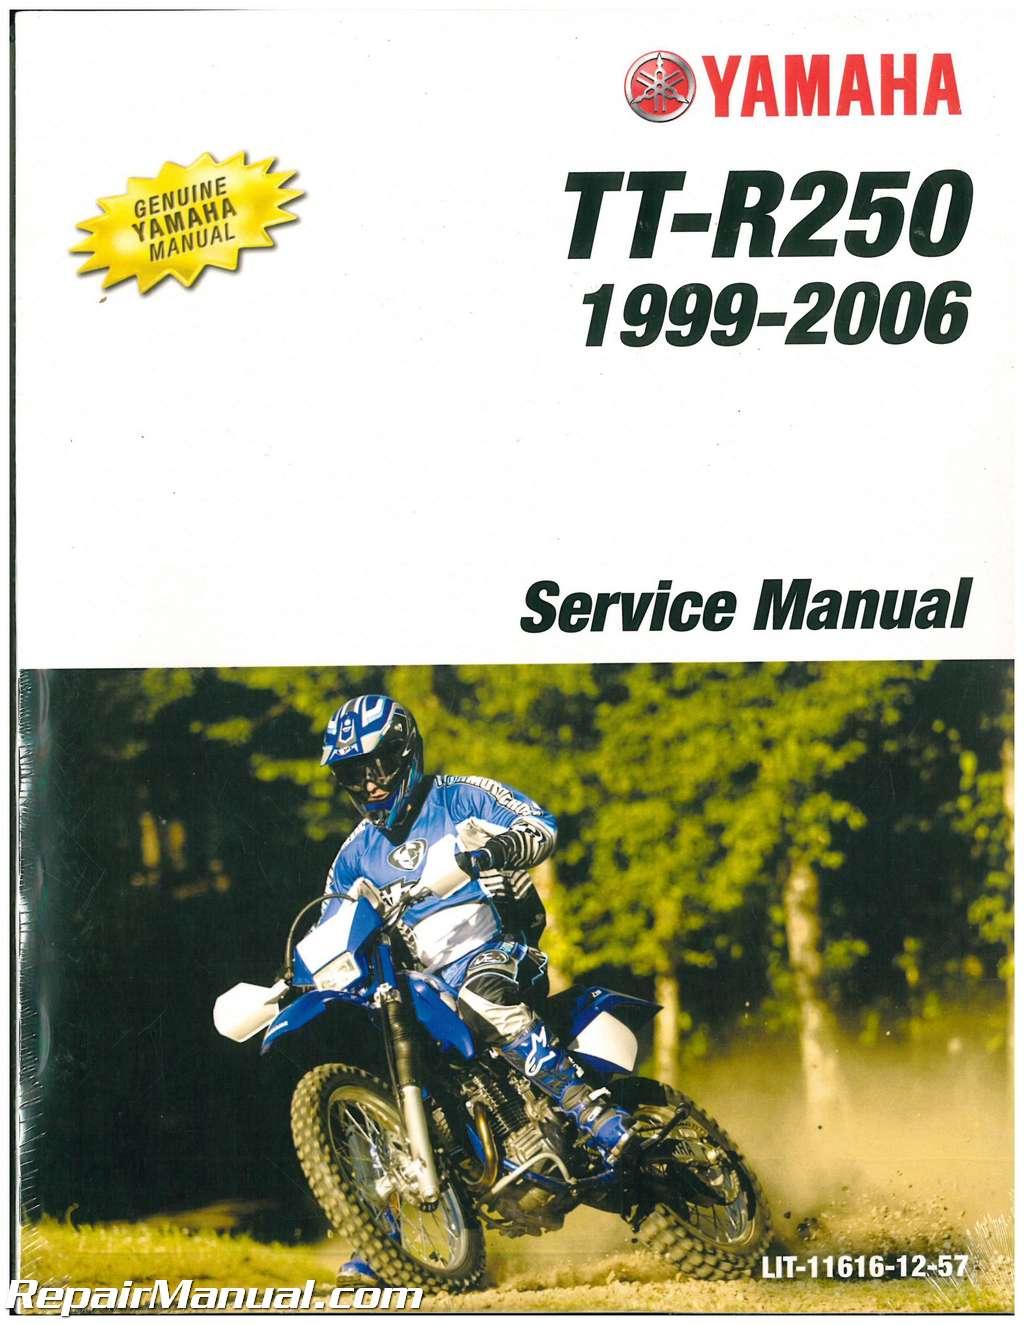 1999 2006 Yamaha Ttr250 Motorcycle Service Manual border=